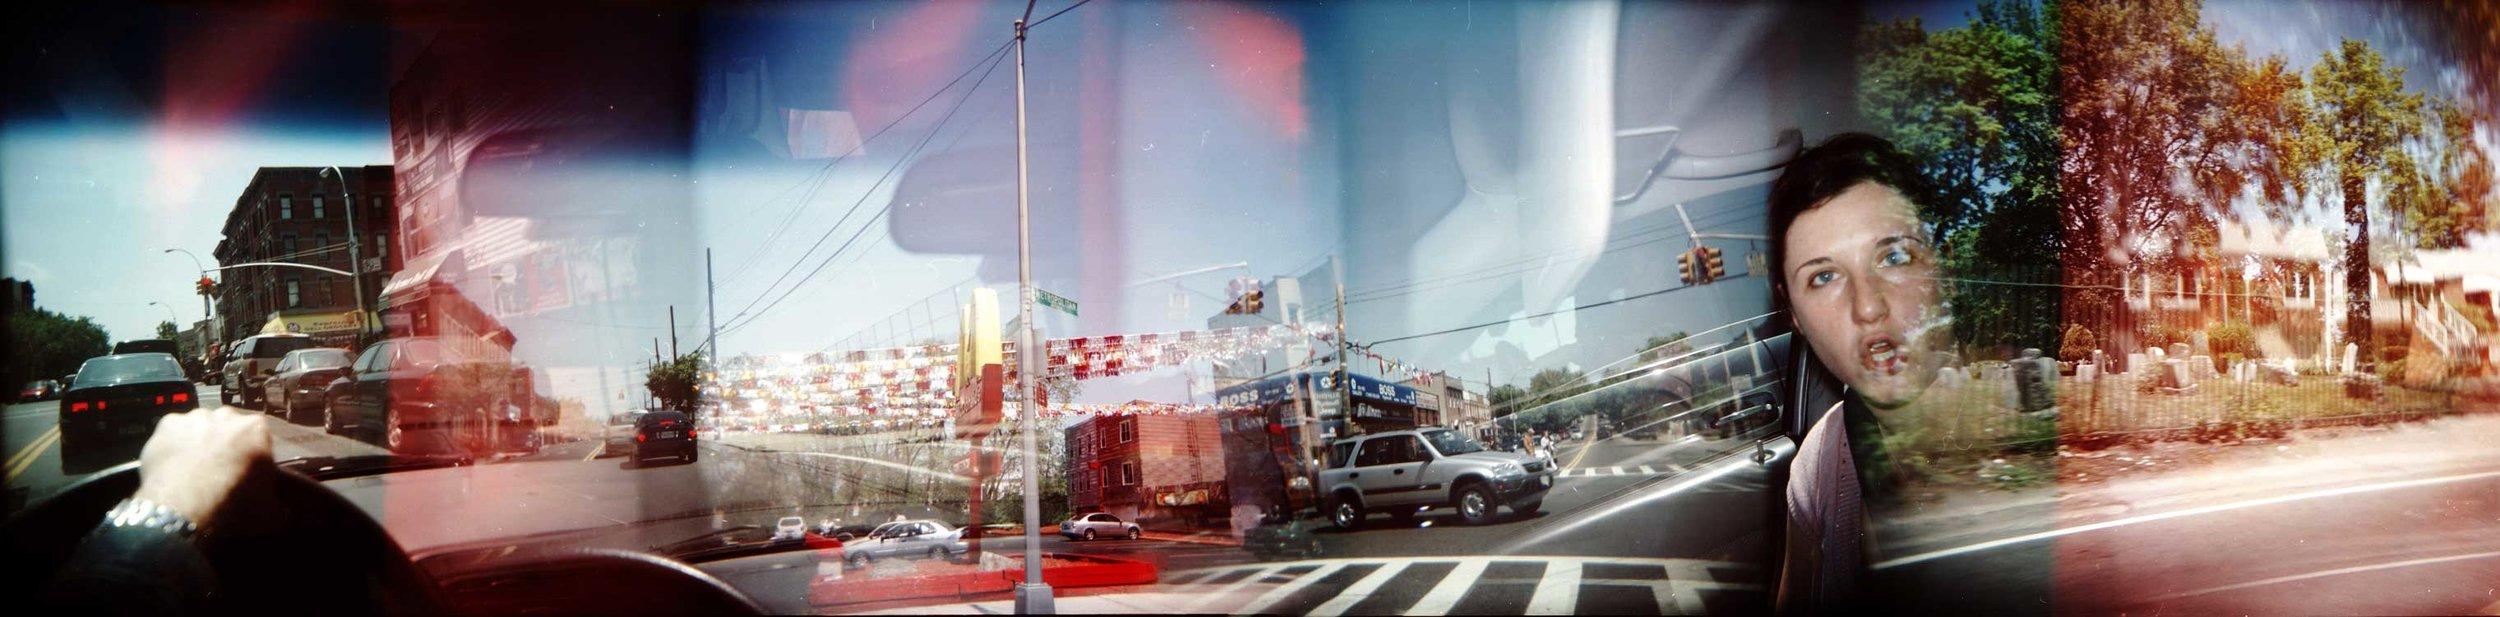 Driving_7.jpg